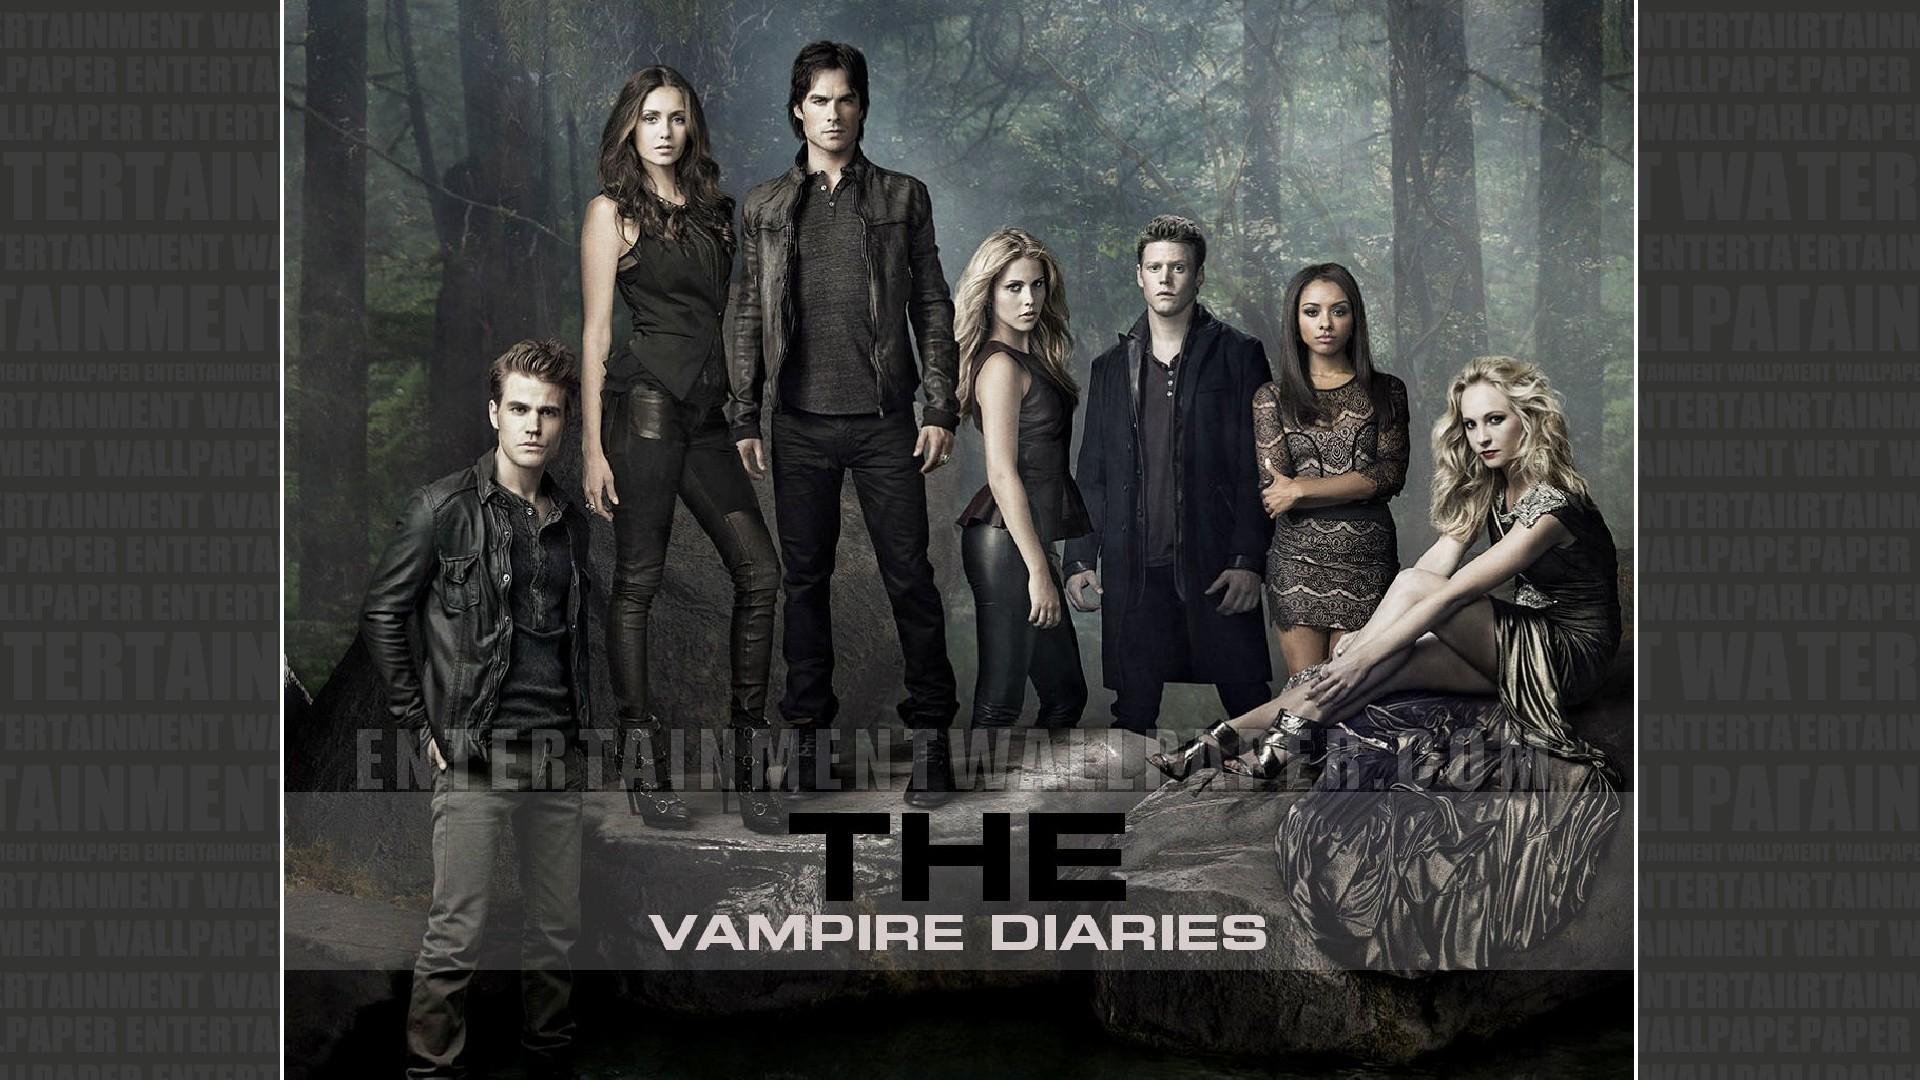 Danielle Campbell The Originals - Vampire Diaries Tv Poster , HD Wallpaper & Backgrounds